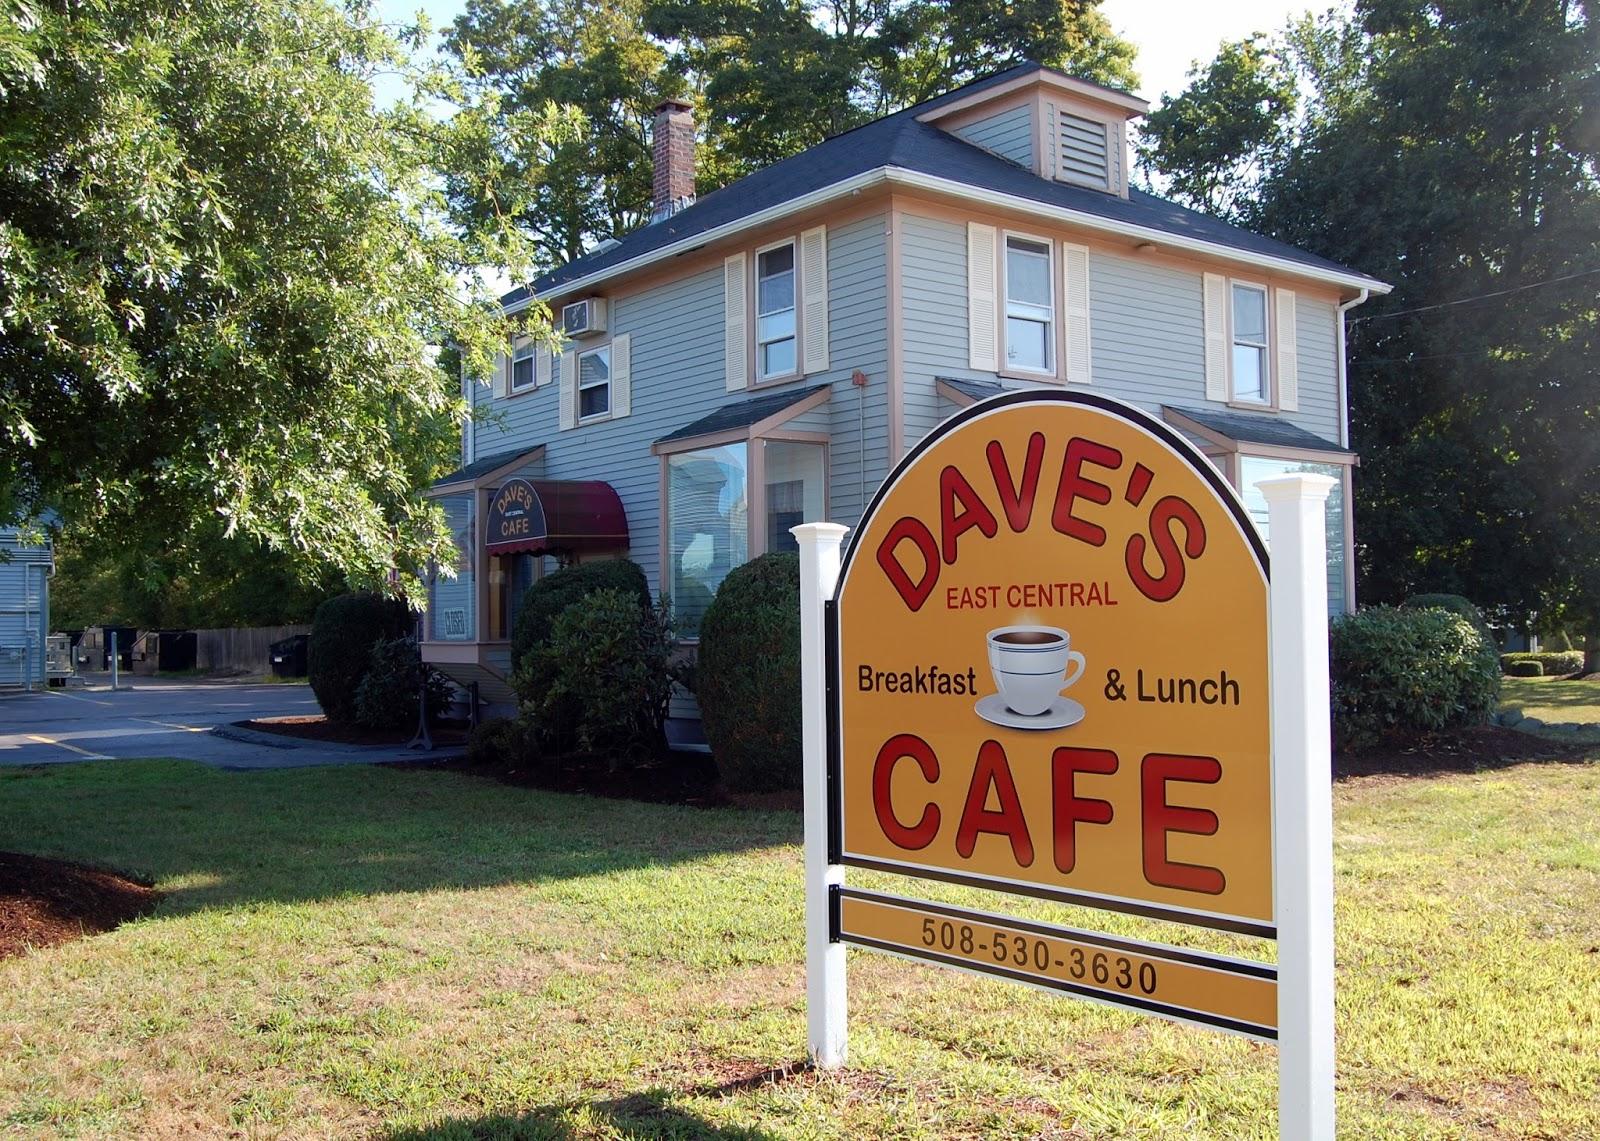 Dave S Cafe Franklin Ma